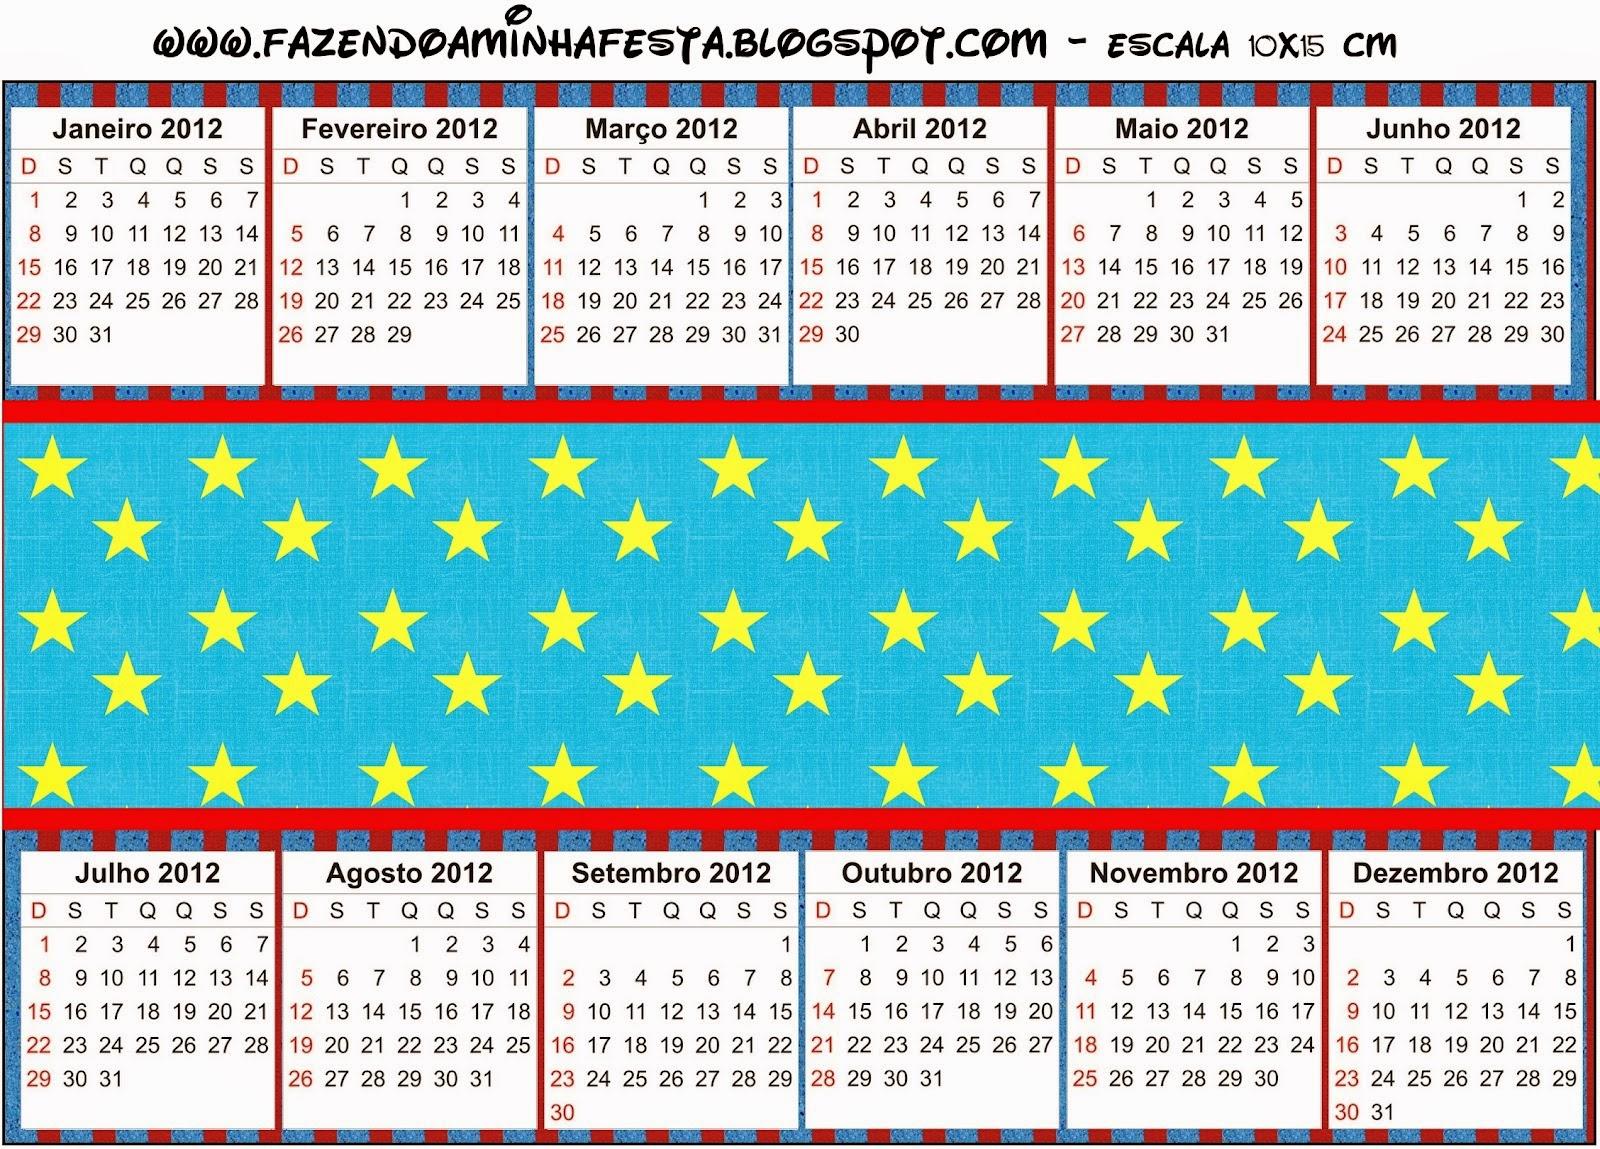 Calendario 2015 para imprimir gratis de Estrellas sobre Fondo Celeste.